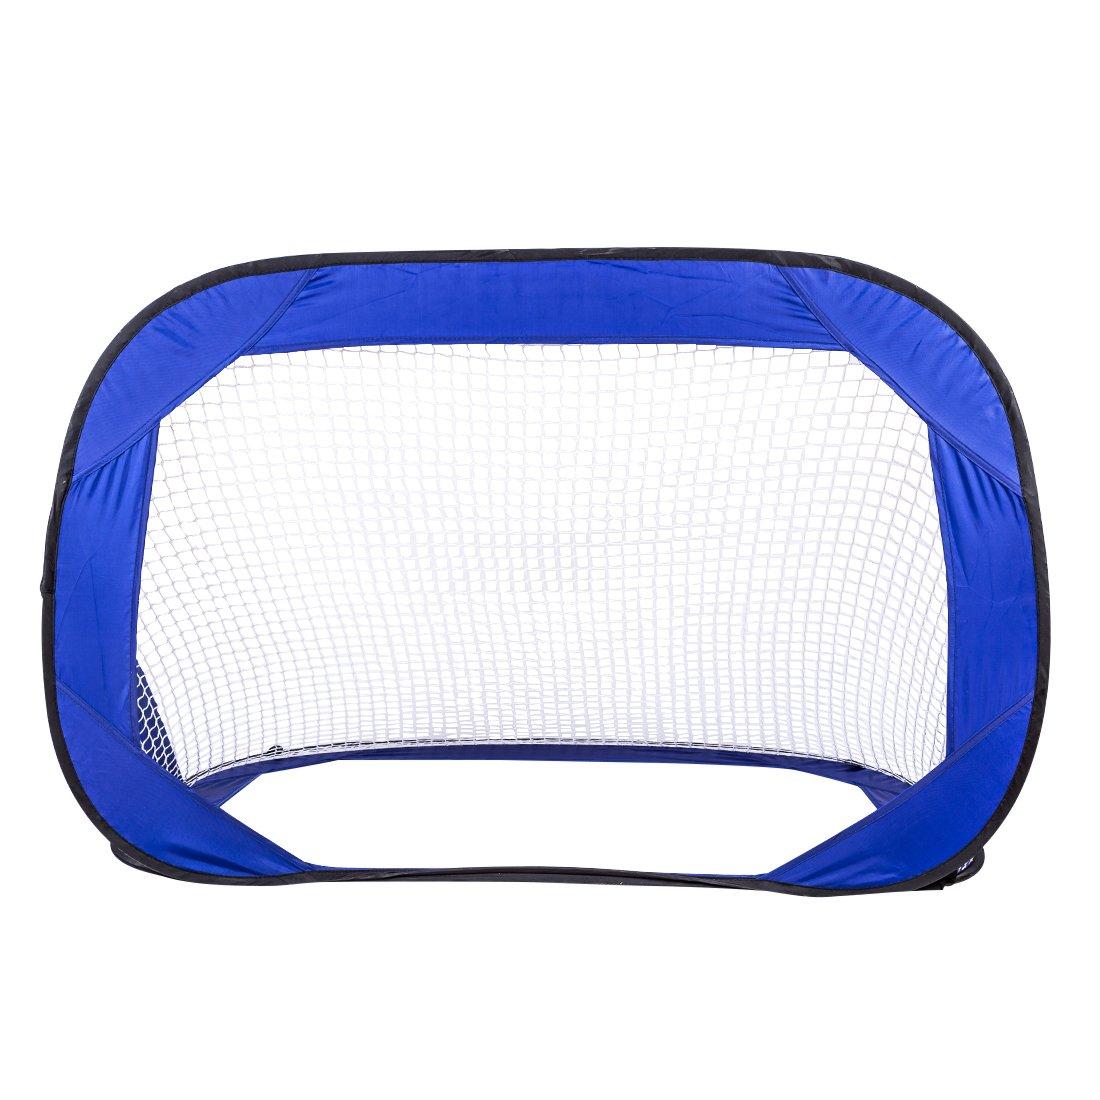 RuiyiF Kids Soccer Goal Net for Backyard Pop Up Portable Toddler Soccer Goal Toy Foldable Indoor Outdoor Toys (Blue)